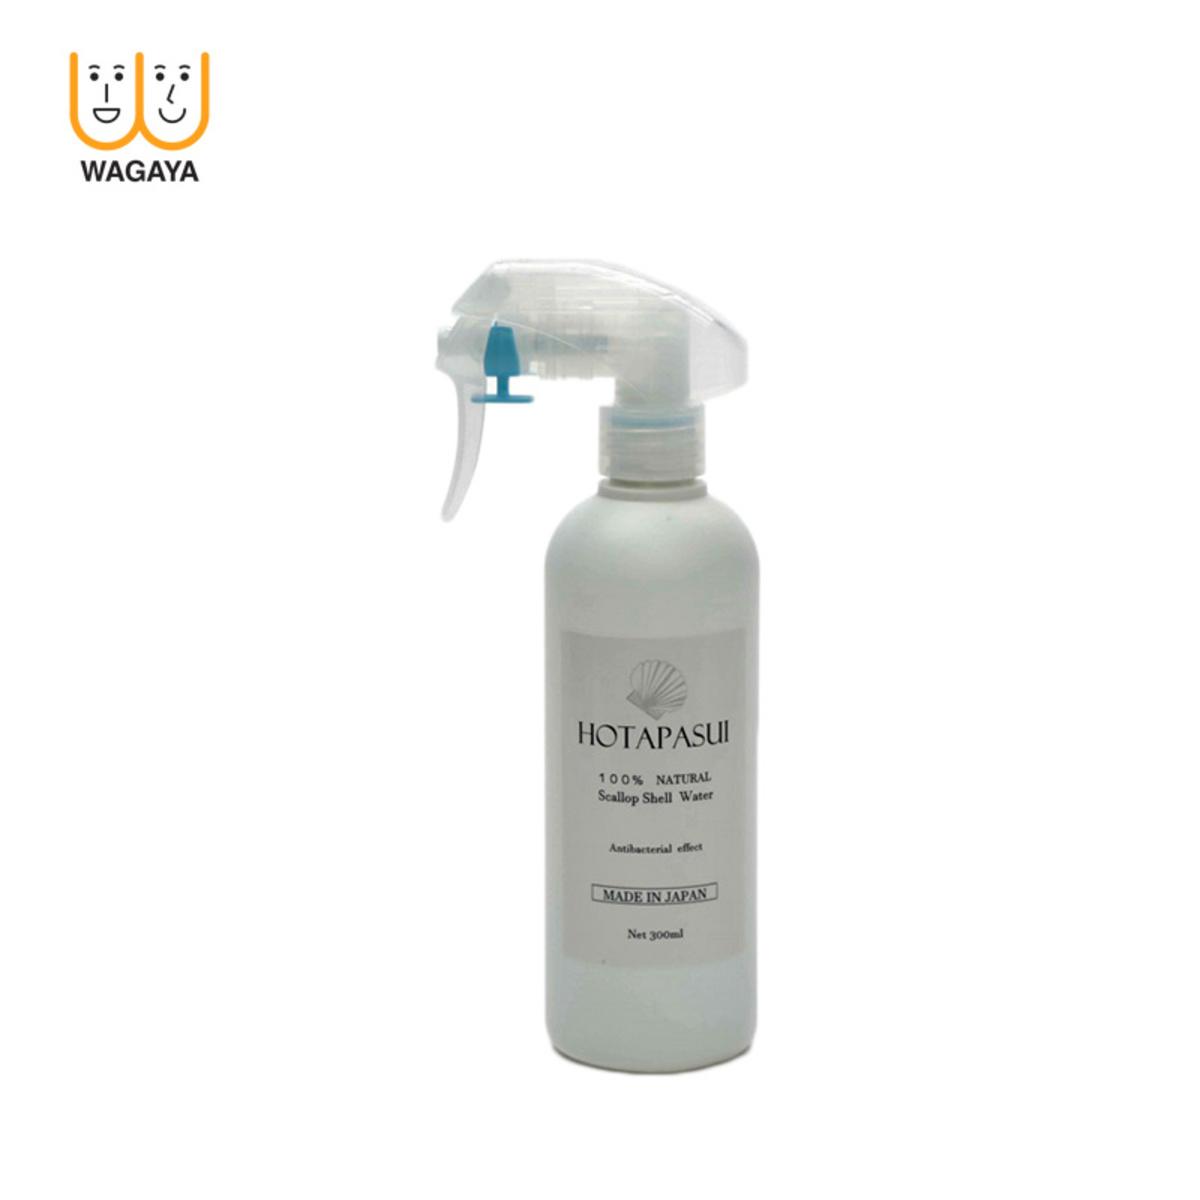 Antibacterial Scallop Shell Spray 300ml